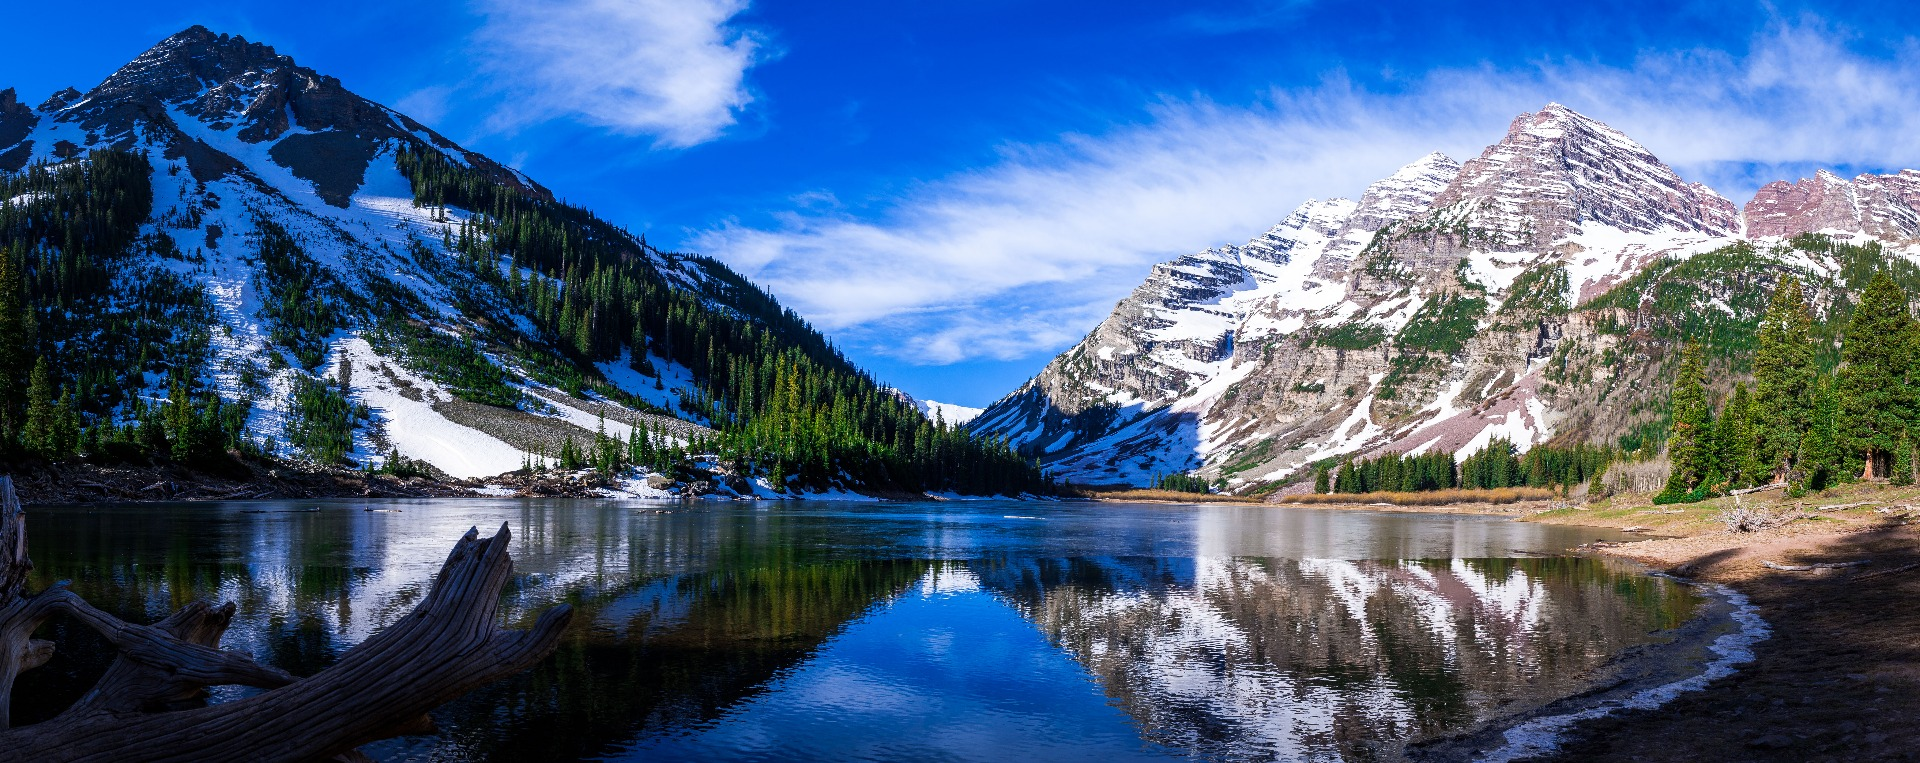 Crater Lake - Maroon Bells near Aspen, CO - Photography Forum